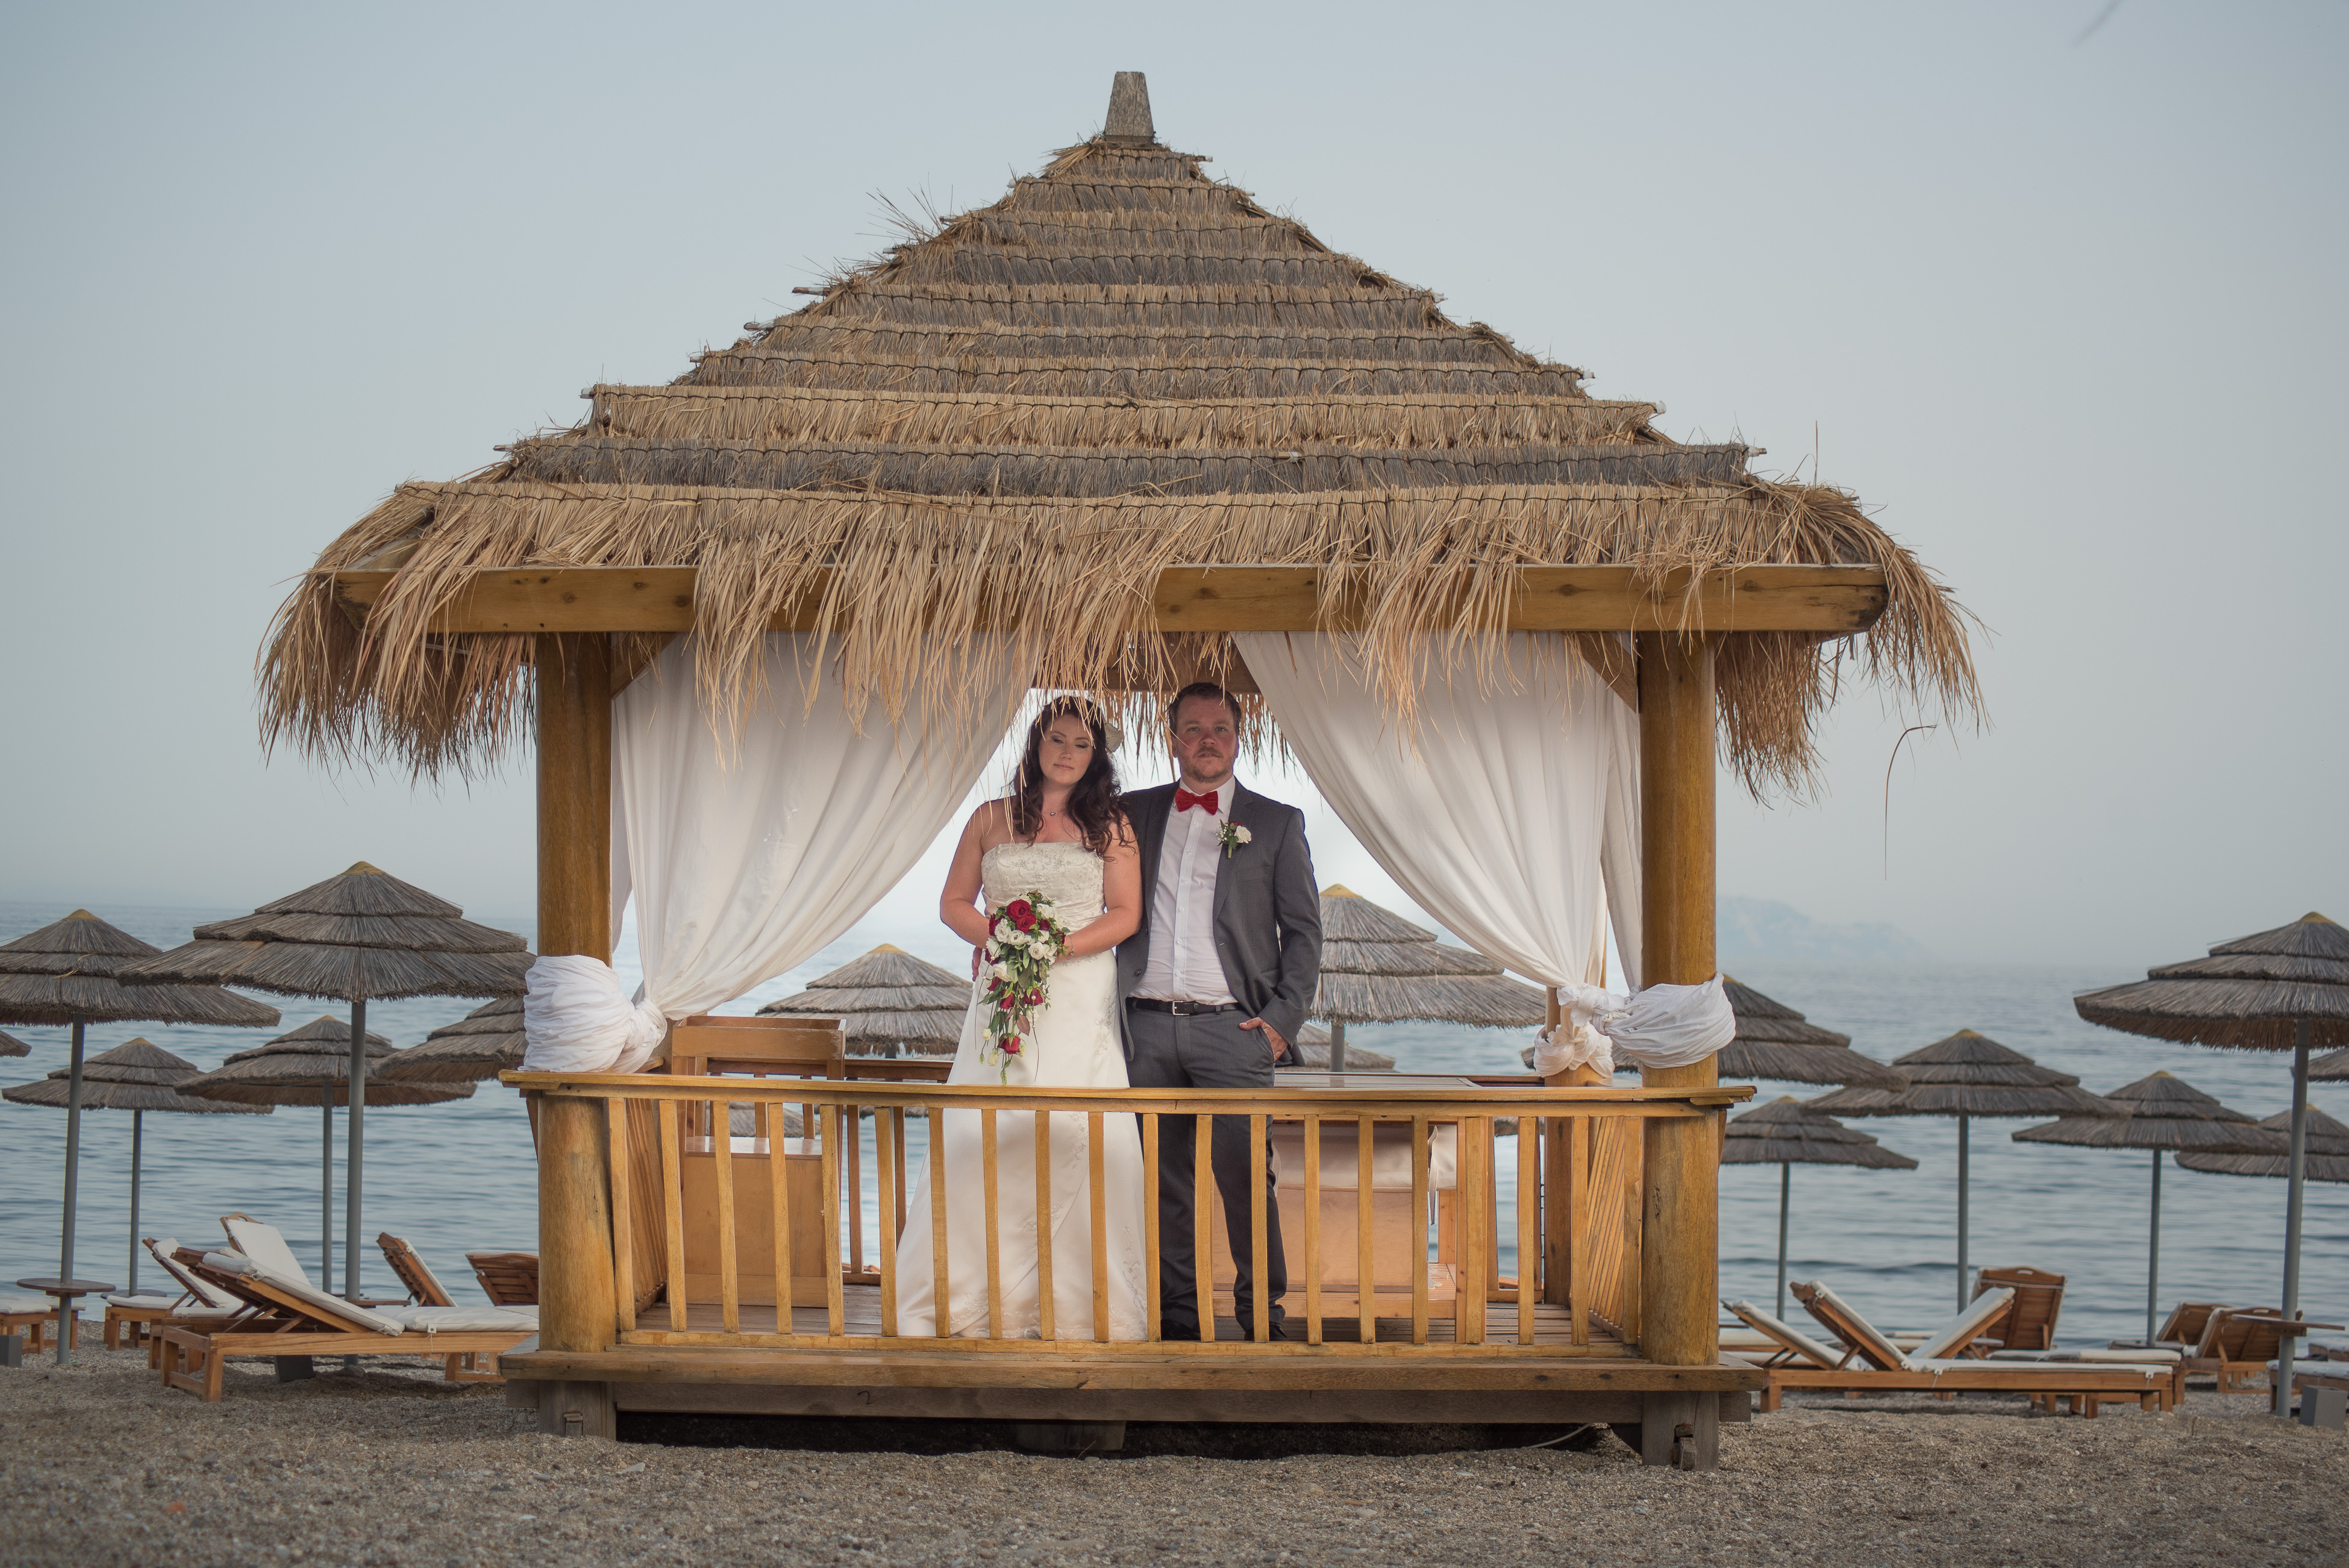 Wedding photographer in Greece and Greek islands